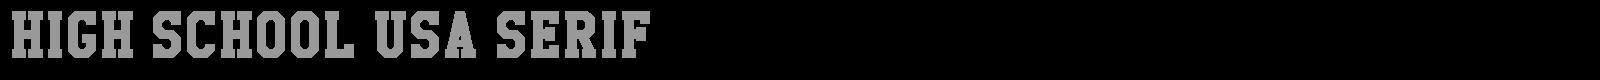 Download Free Font High School USA Serif